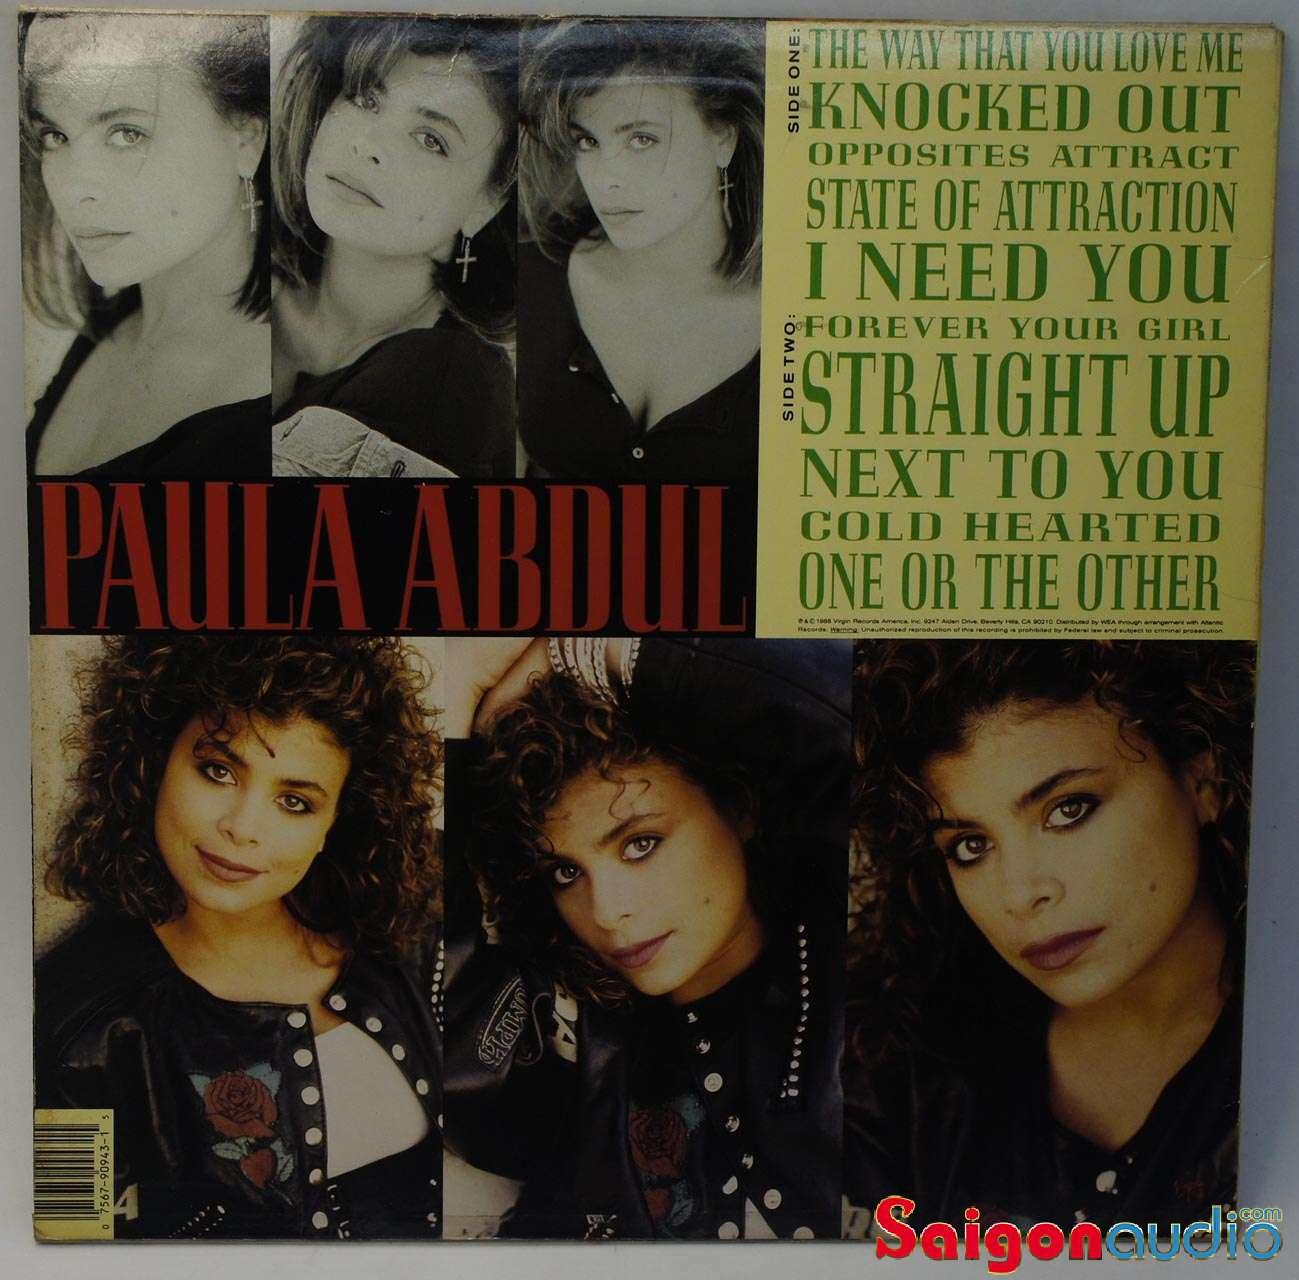 Đĩa than Paula Abdul - Forever your girl (1988) | LP Vinyl Records